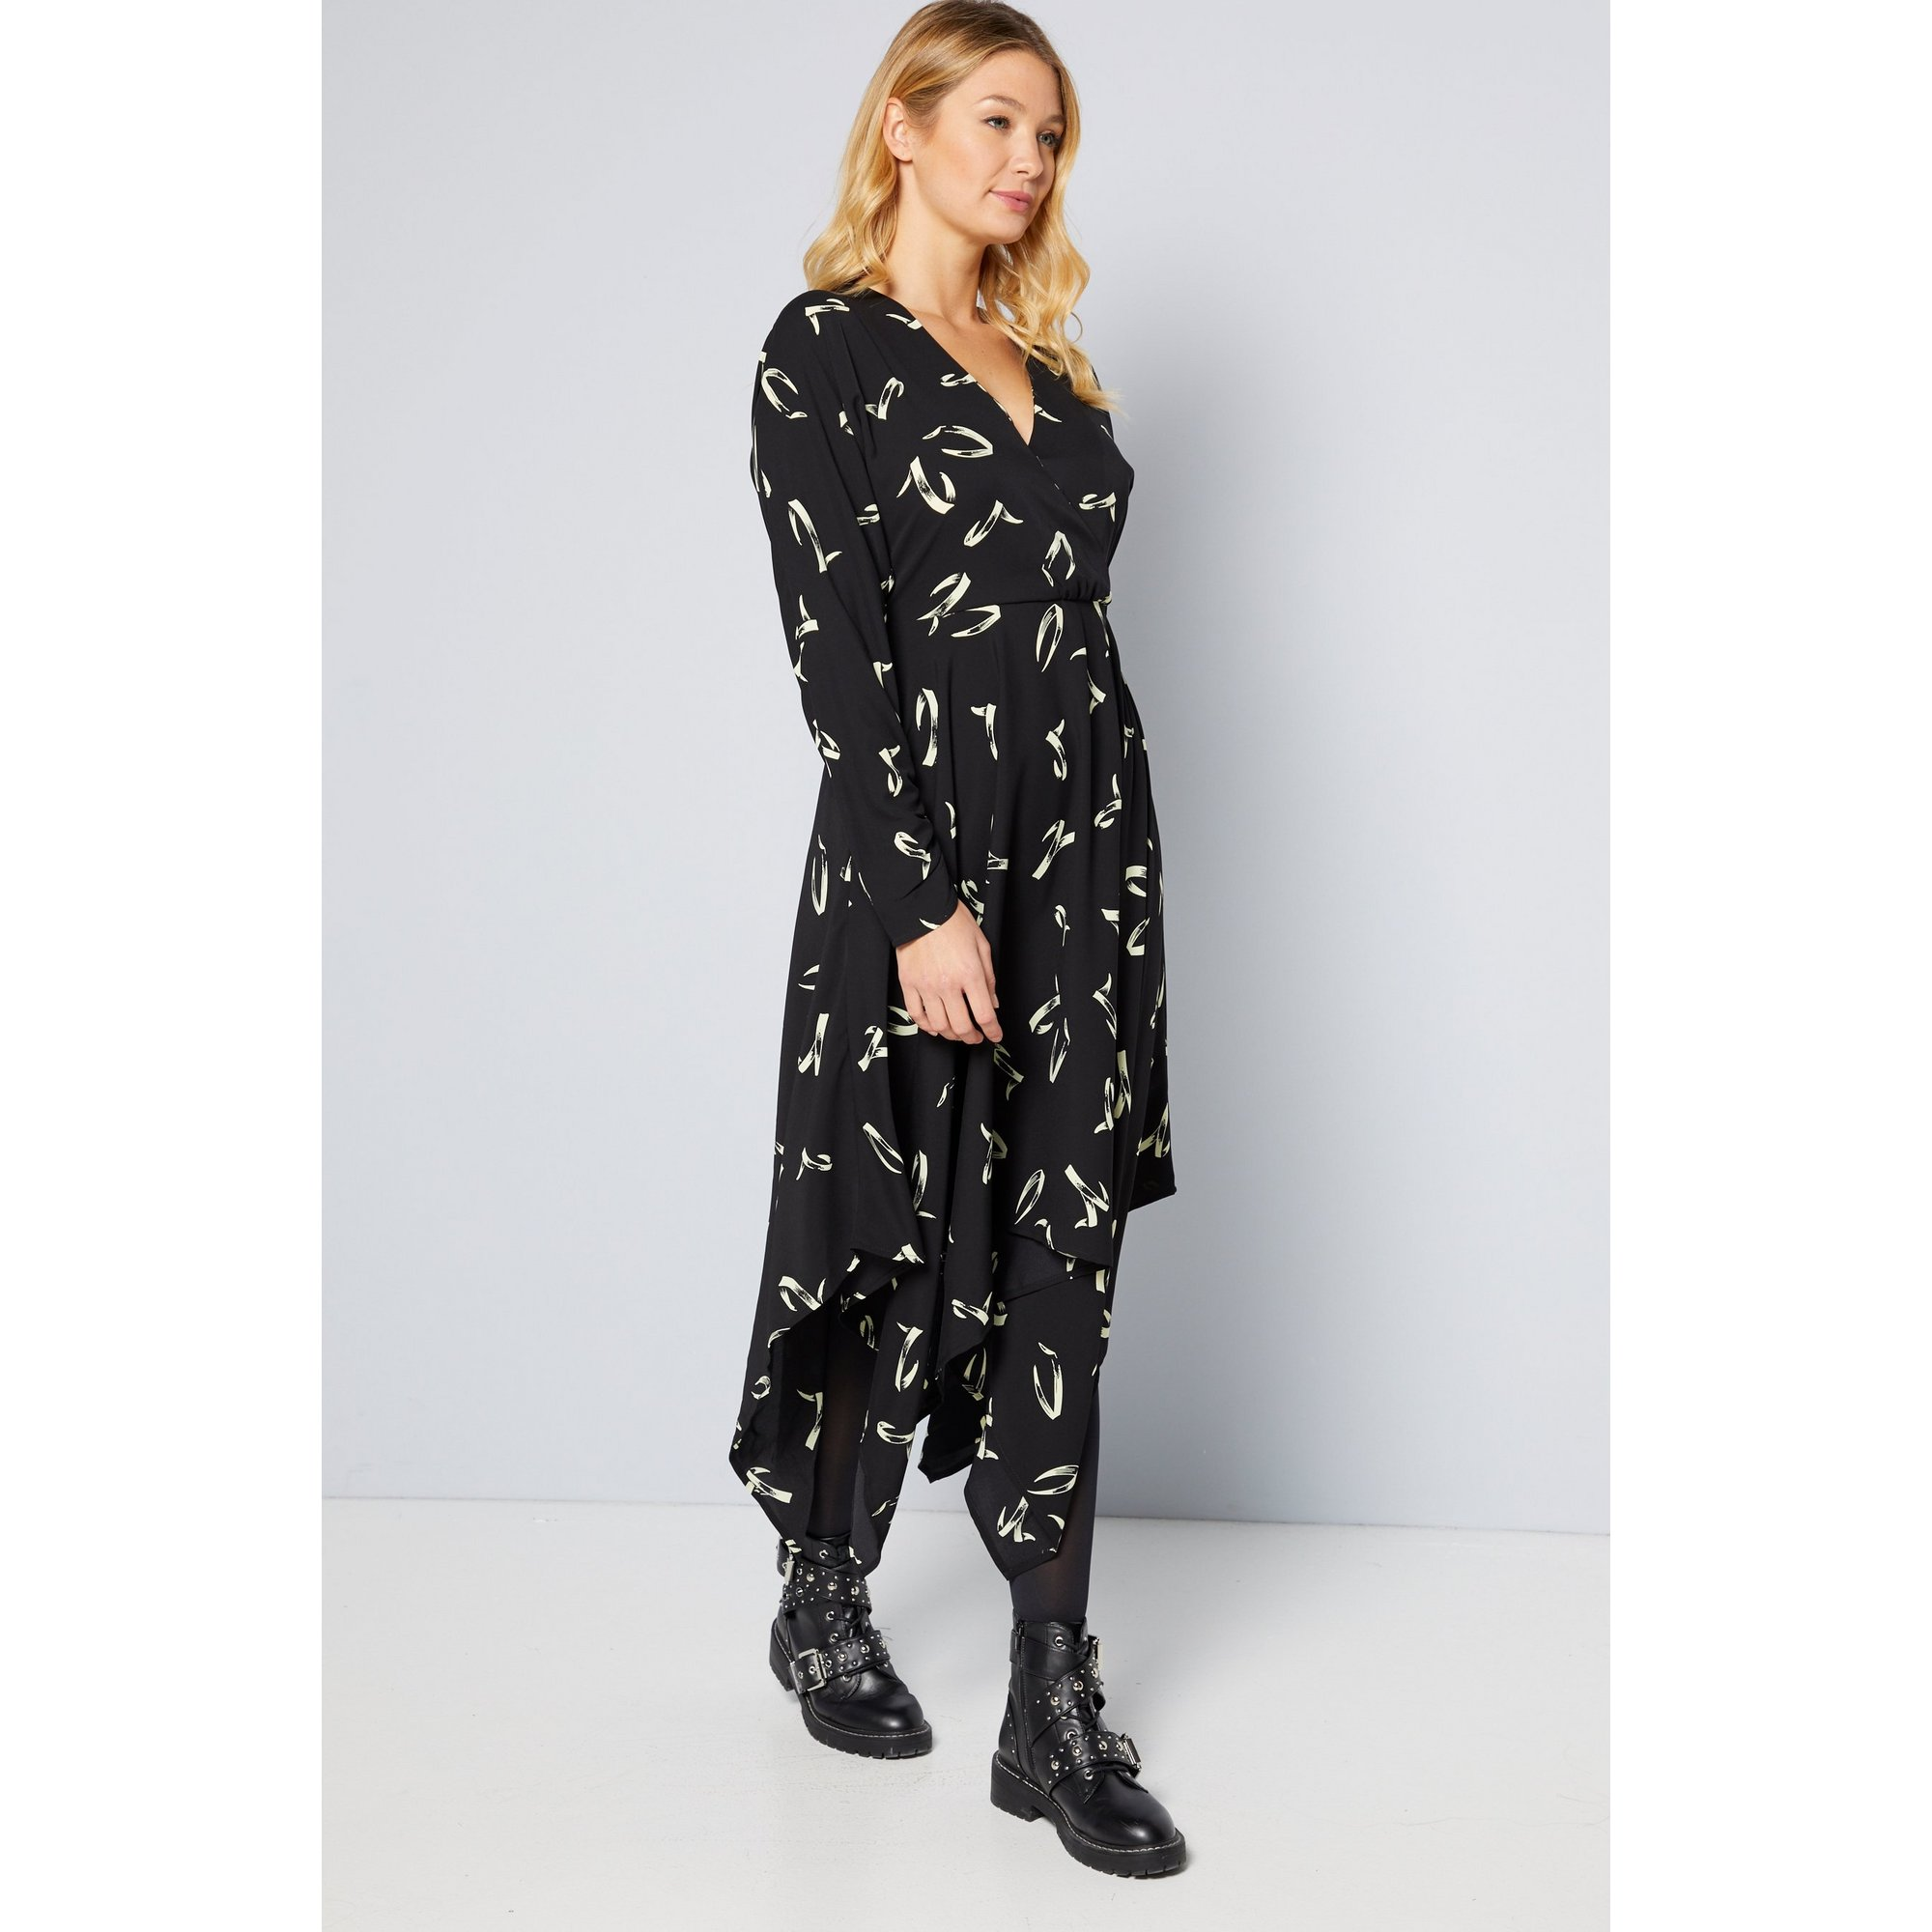 Image of AX Paris Black Wrap Hanky Hem Midi Dress